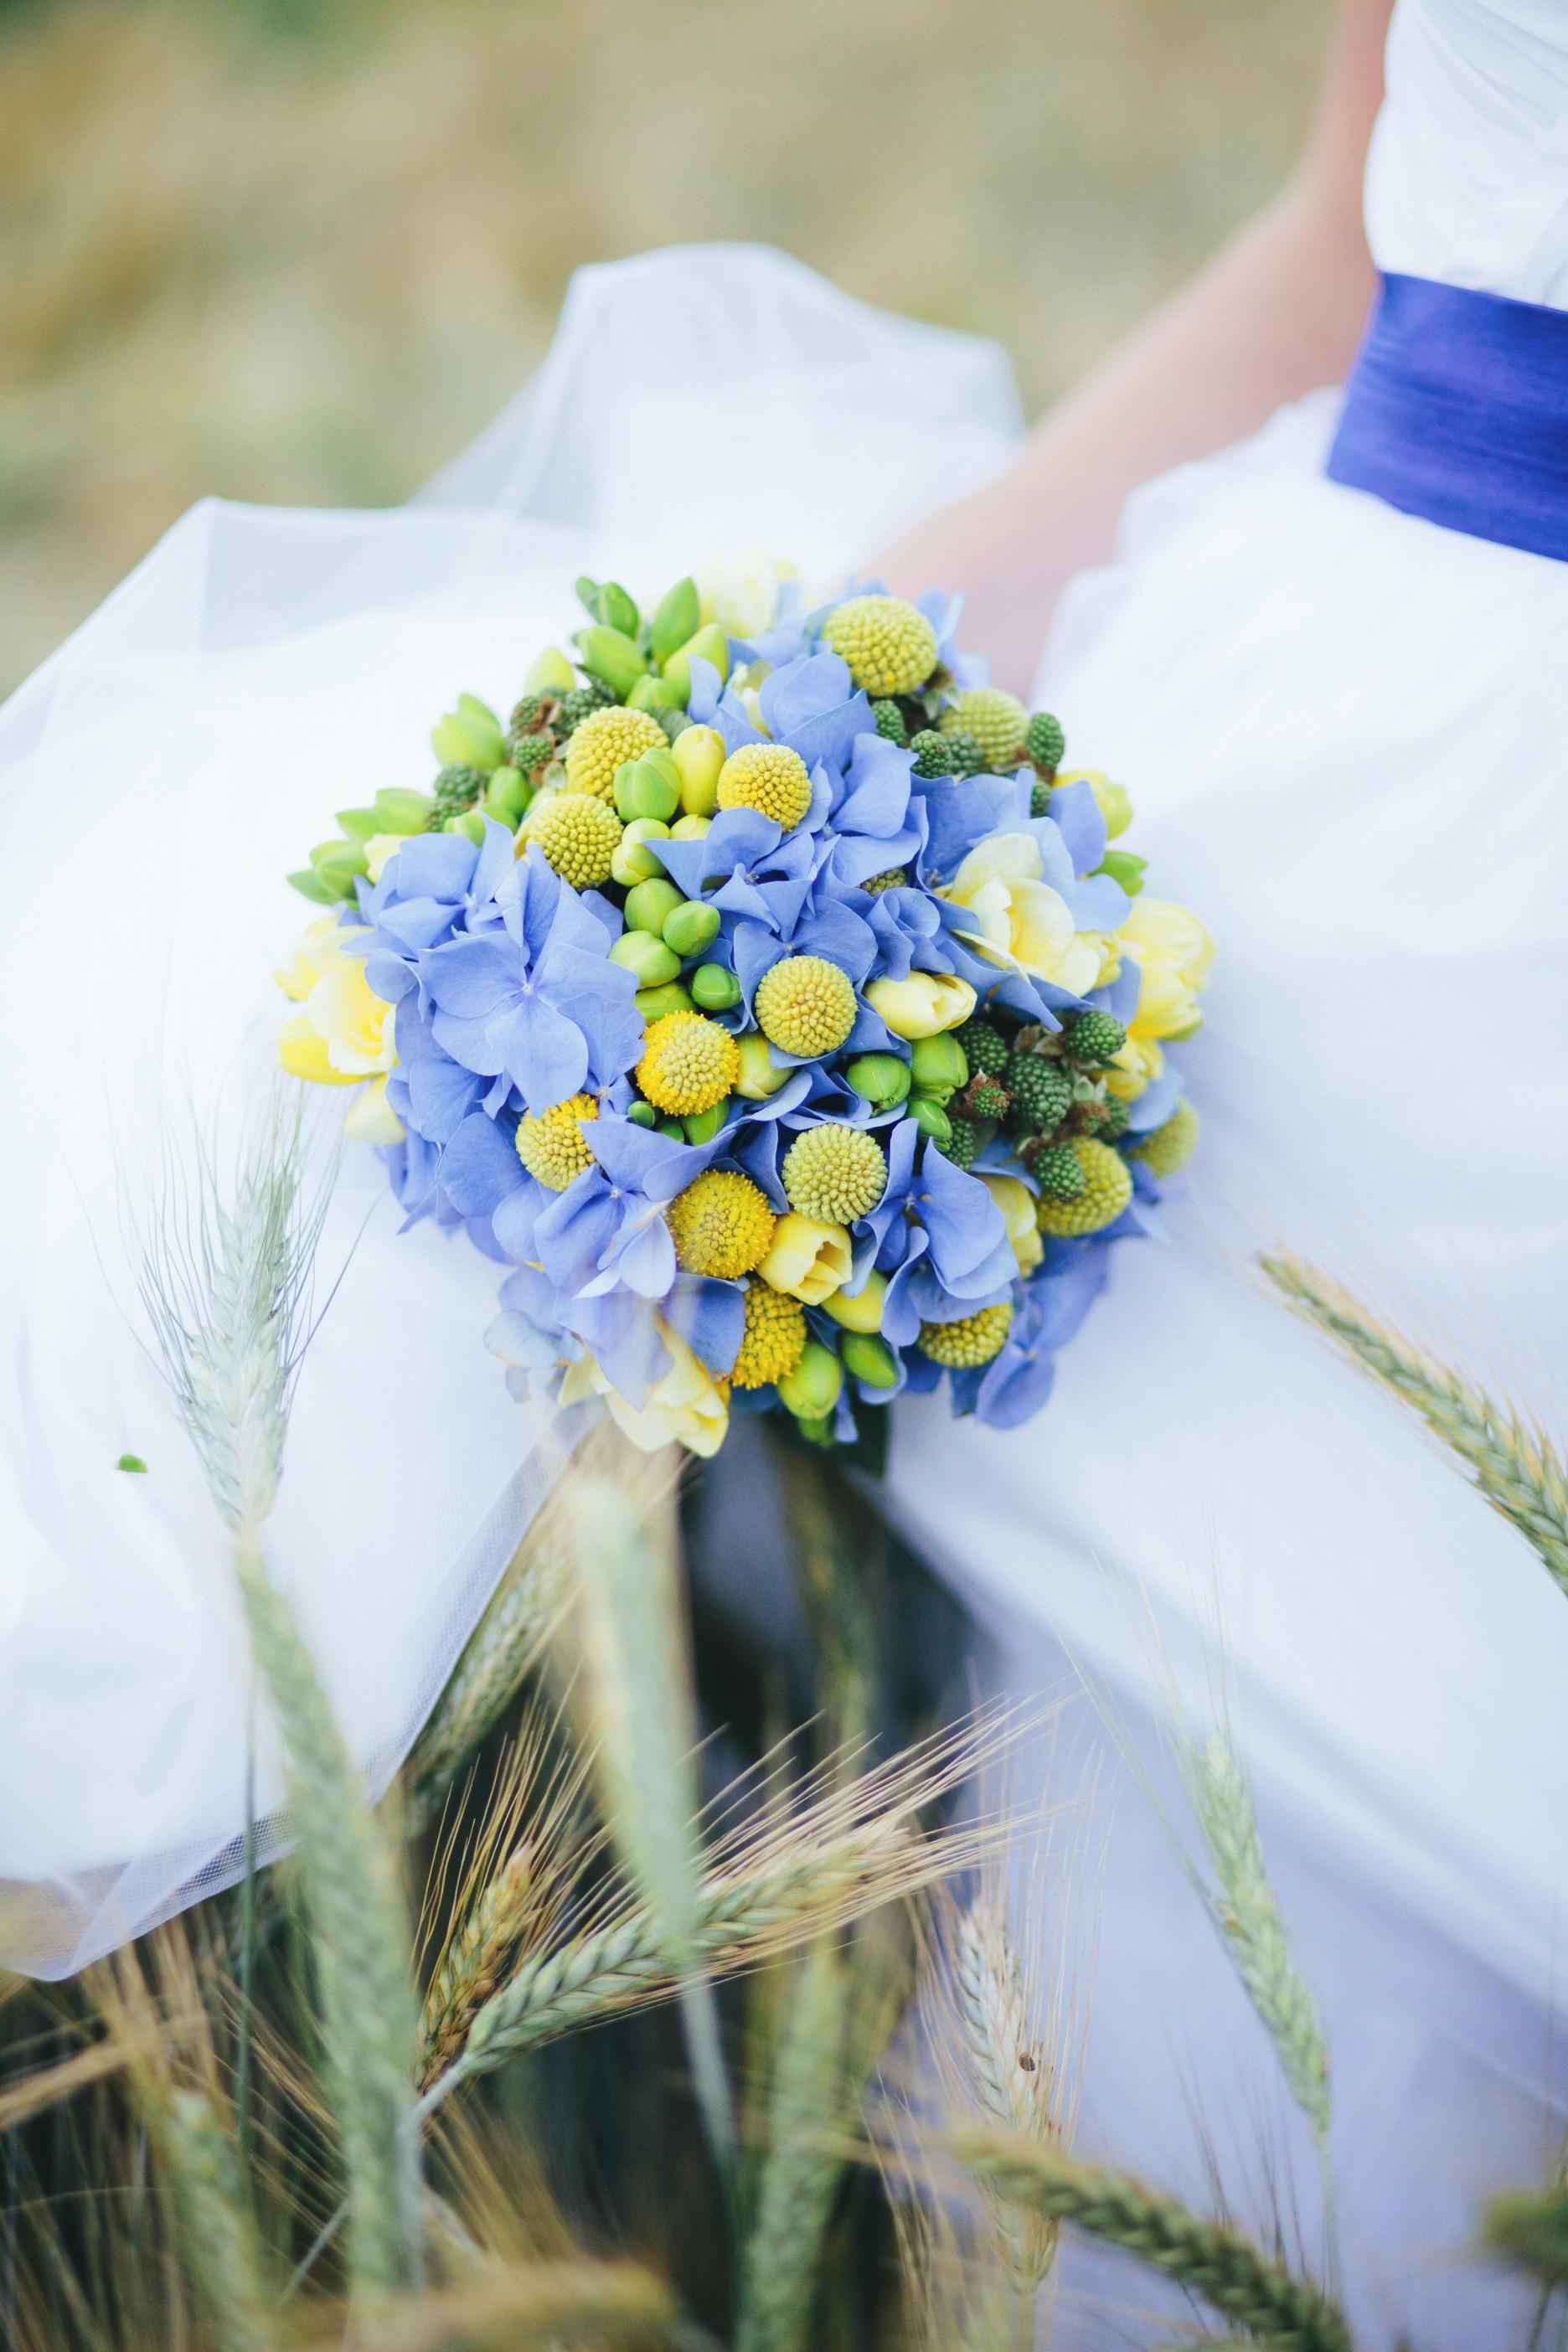 Free Images Petal Spring Green Yellow Flora Floristry Bridal